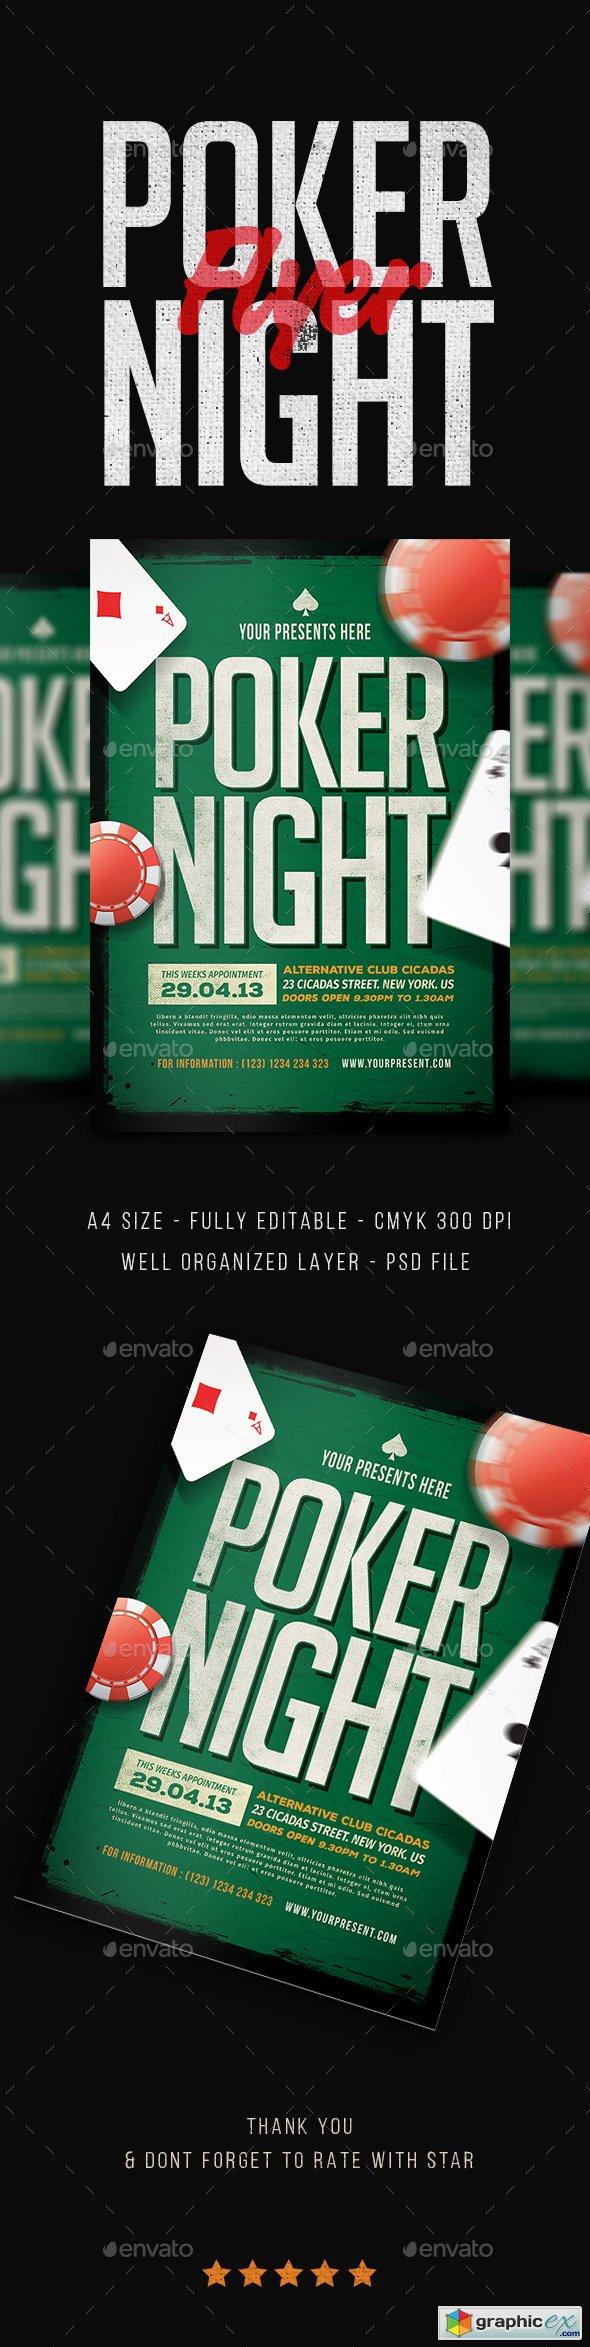 Poker night poster template : Truc et astuces black jack